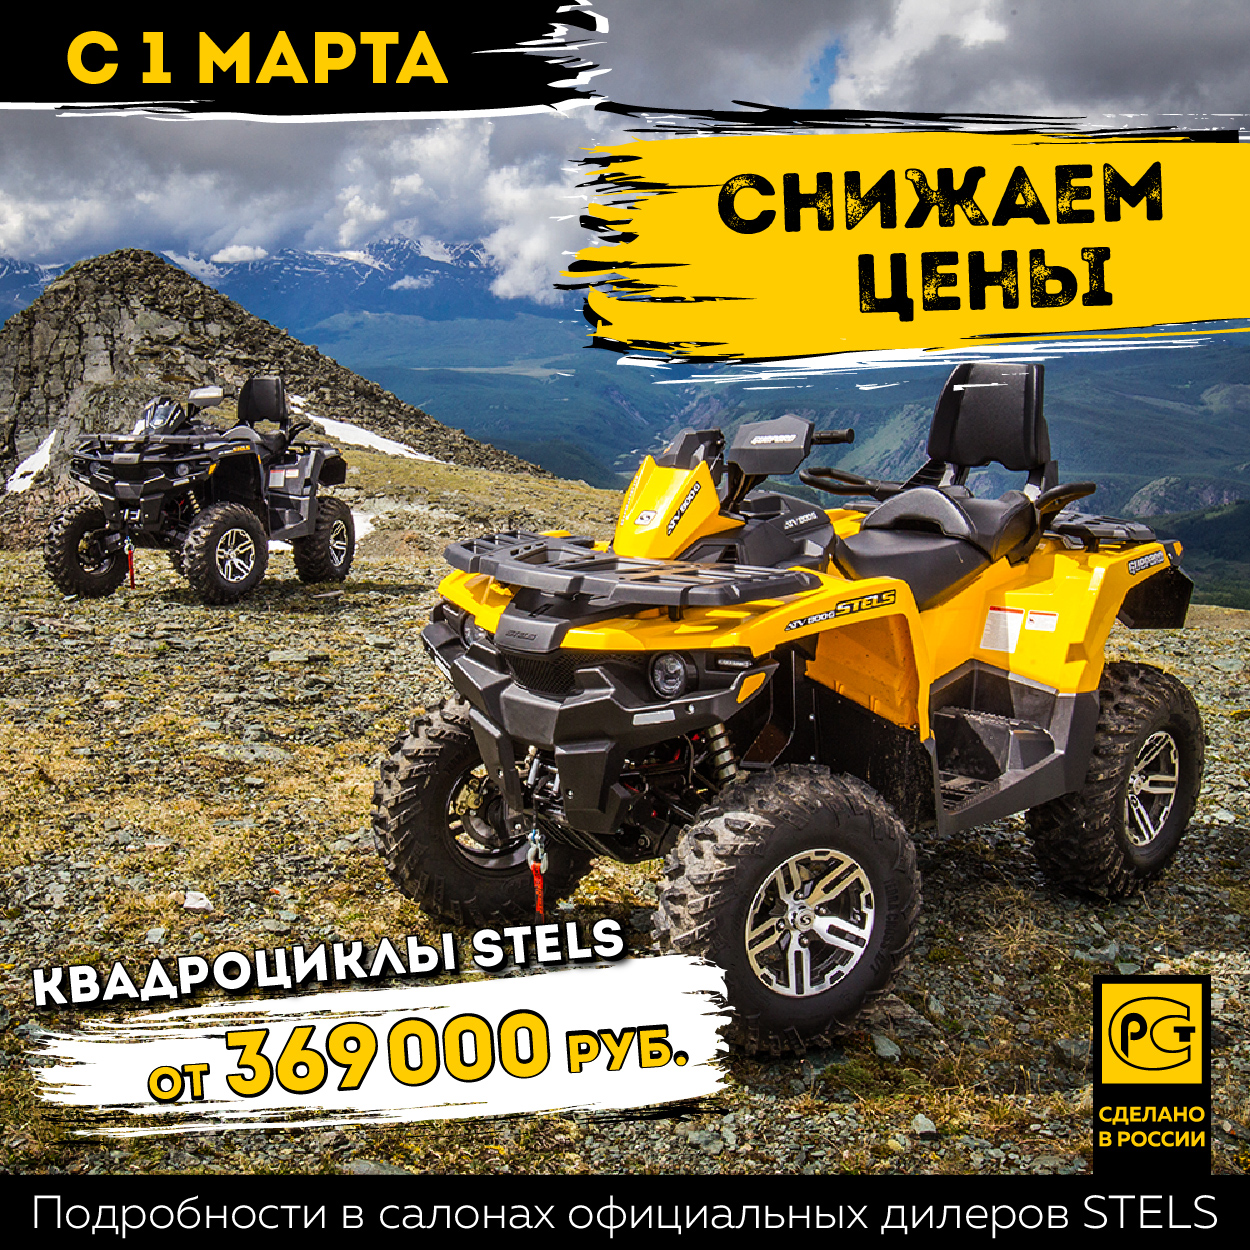 http://www.stels-stavropol.ru/uploads/images/s4.jpg